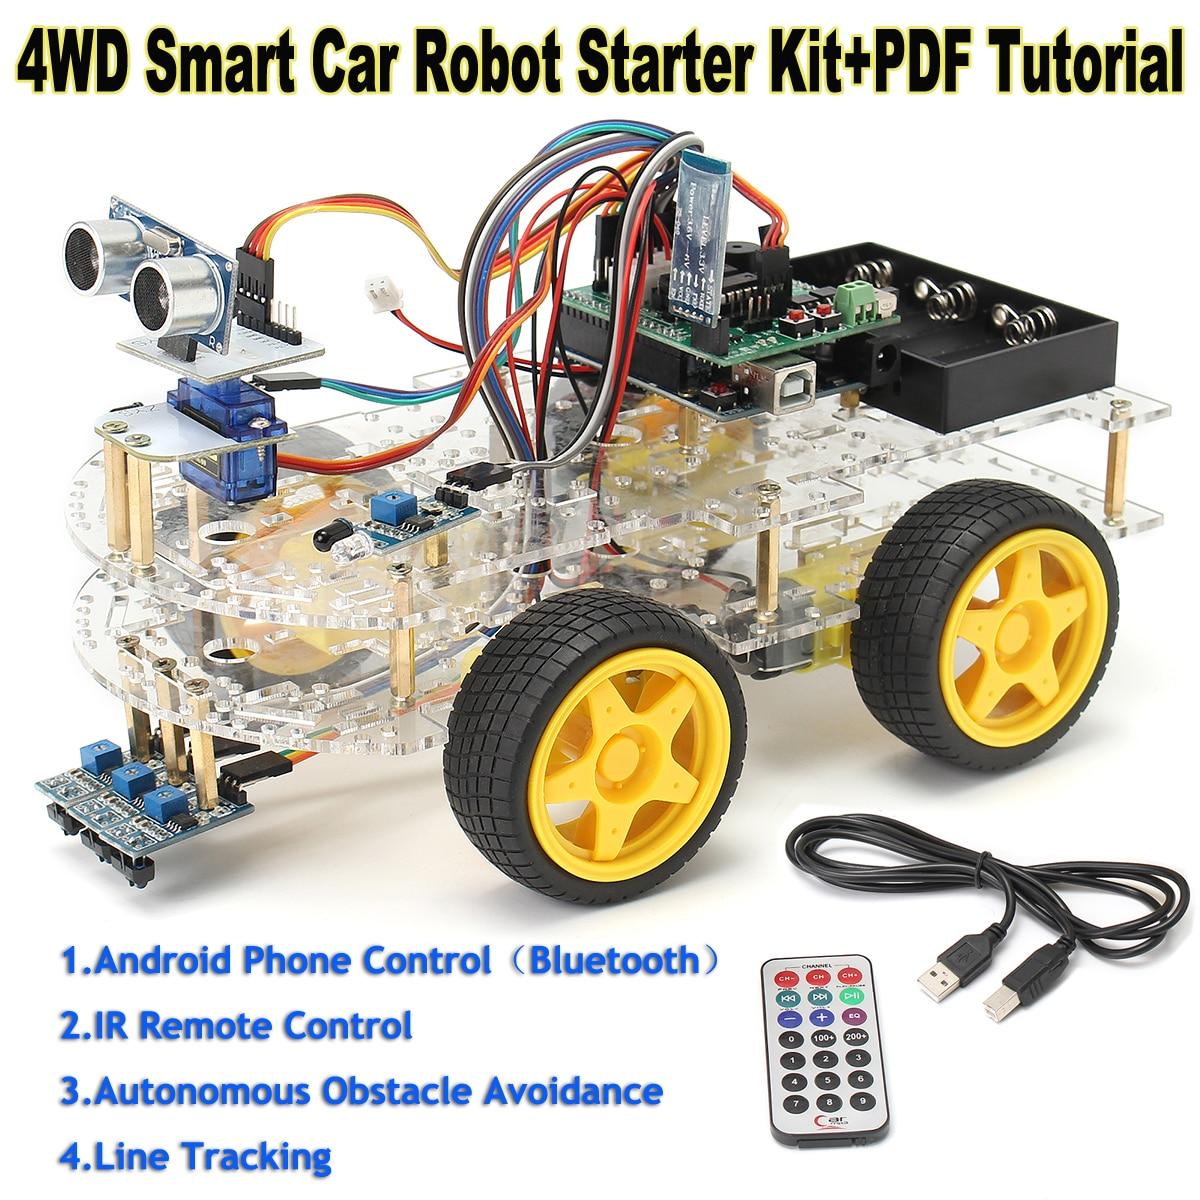 4WD Smart Car Robot Learning Starter Kit for Arduino Programmable Robot DIY